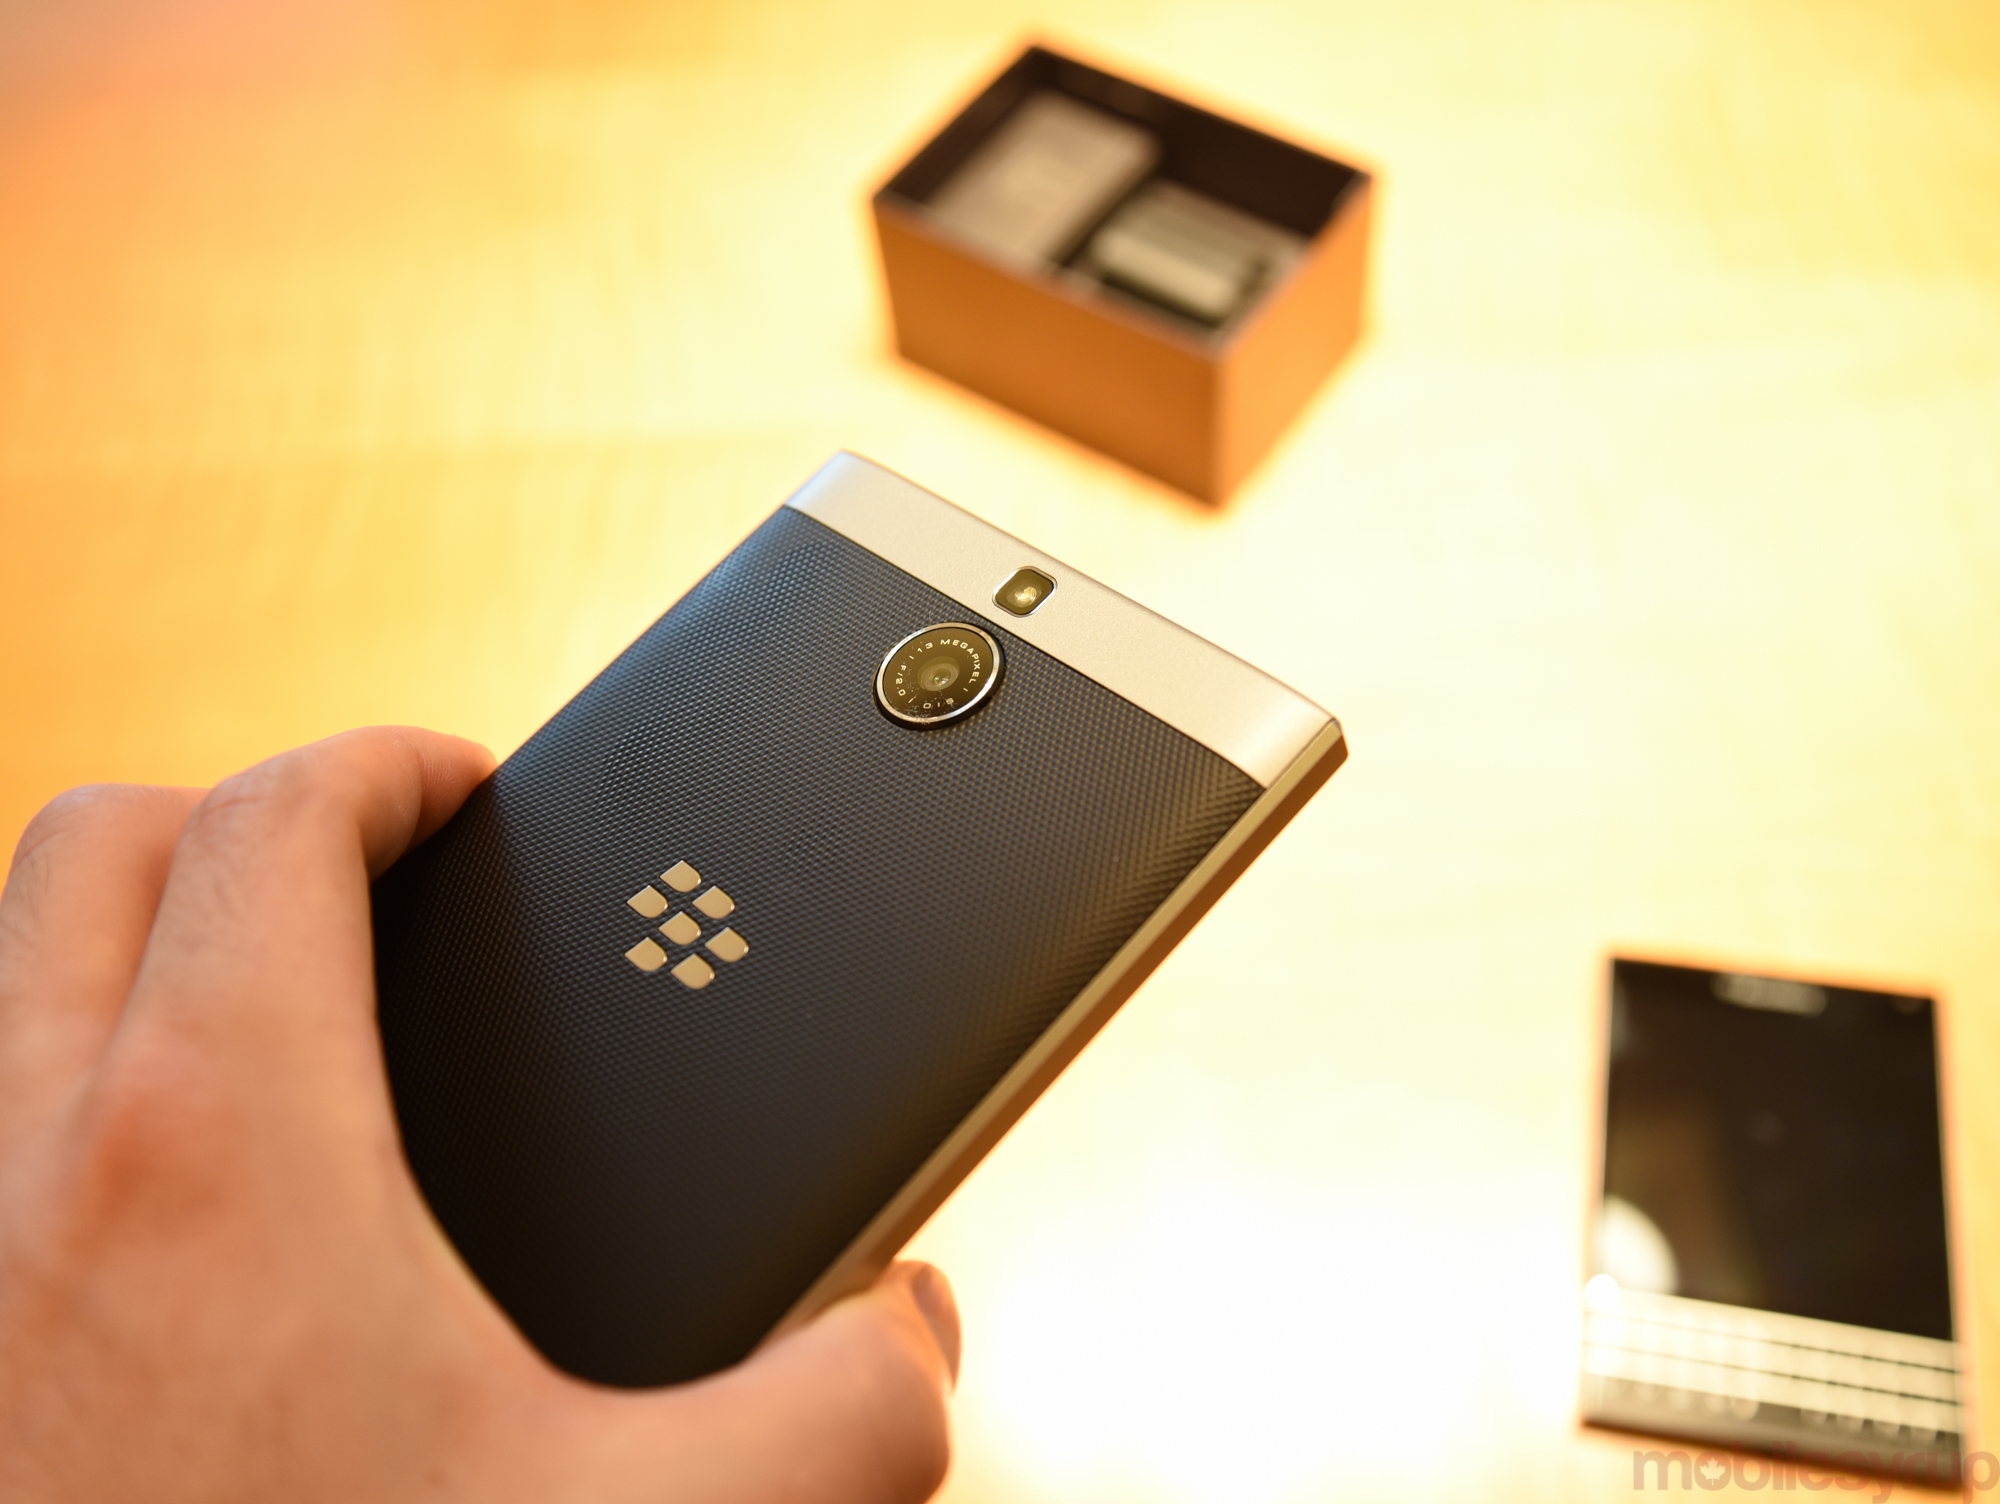 blackberrypassportsilveredition-0327